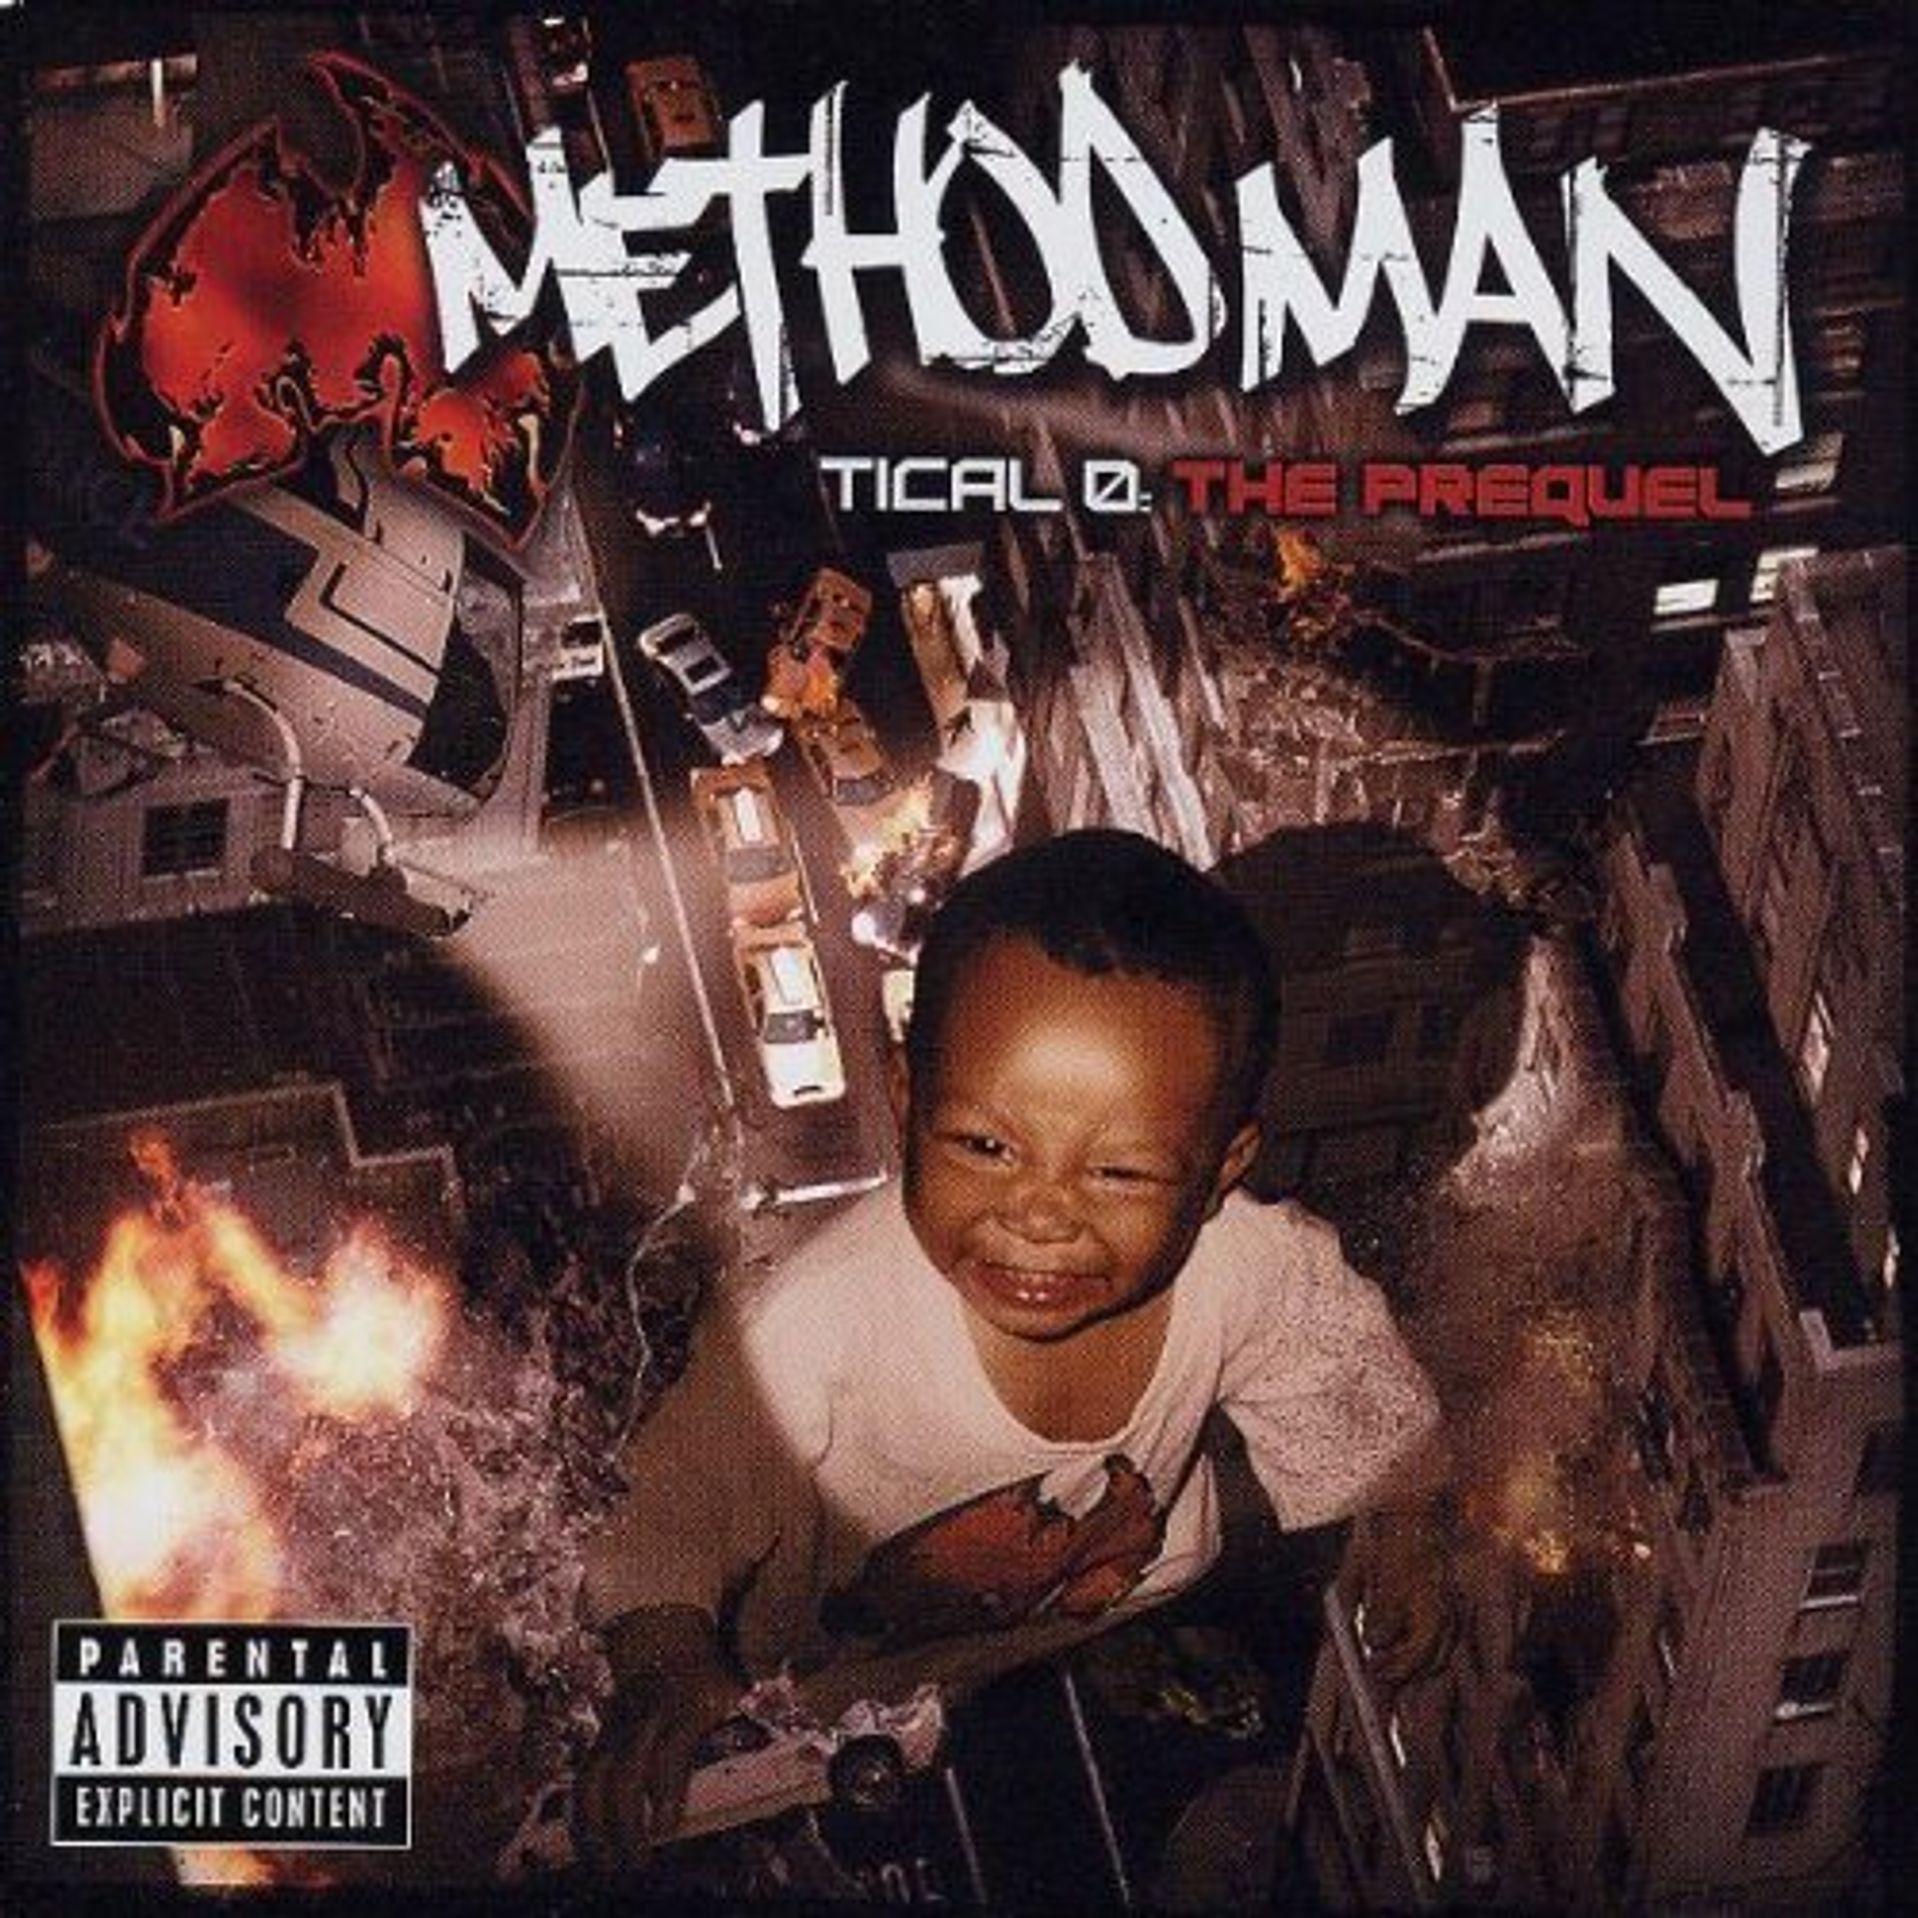 Album Title: Tical 0: The Prequel by: Method Man